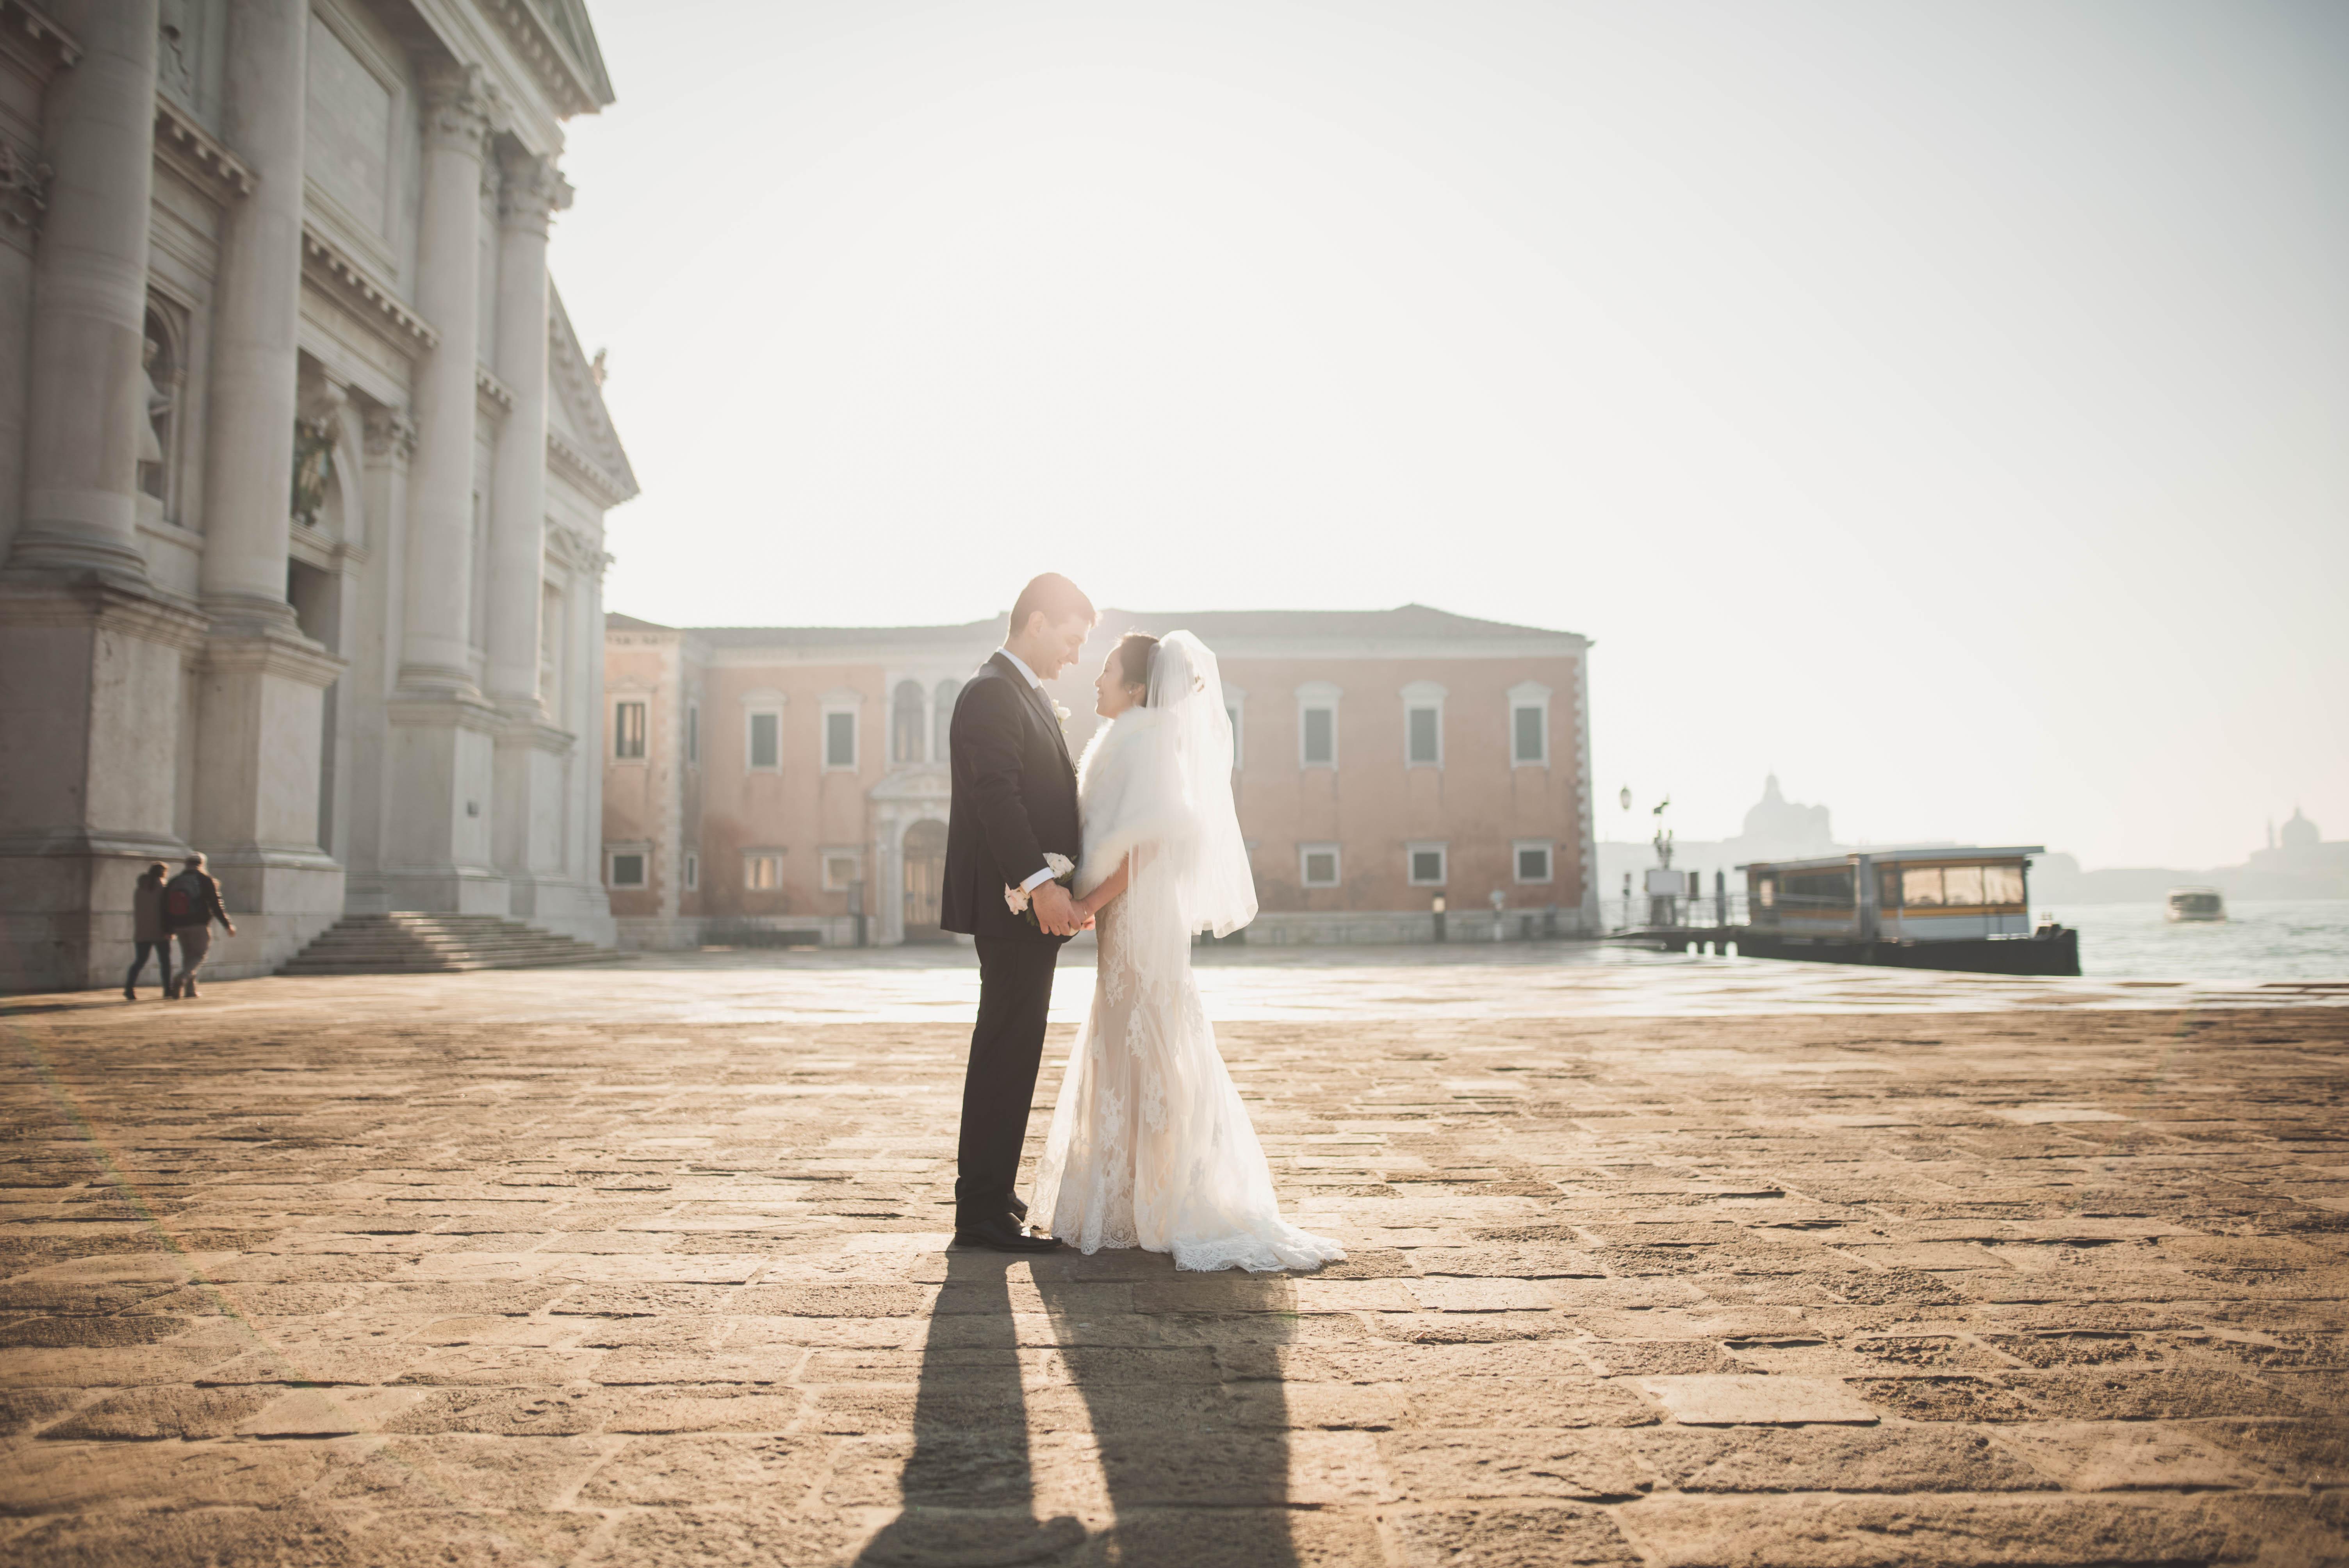 Matrimoni Trento e Verona